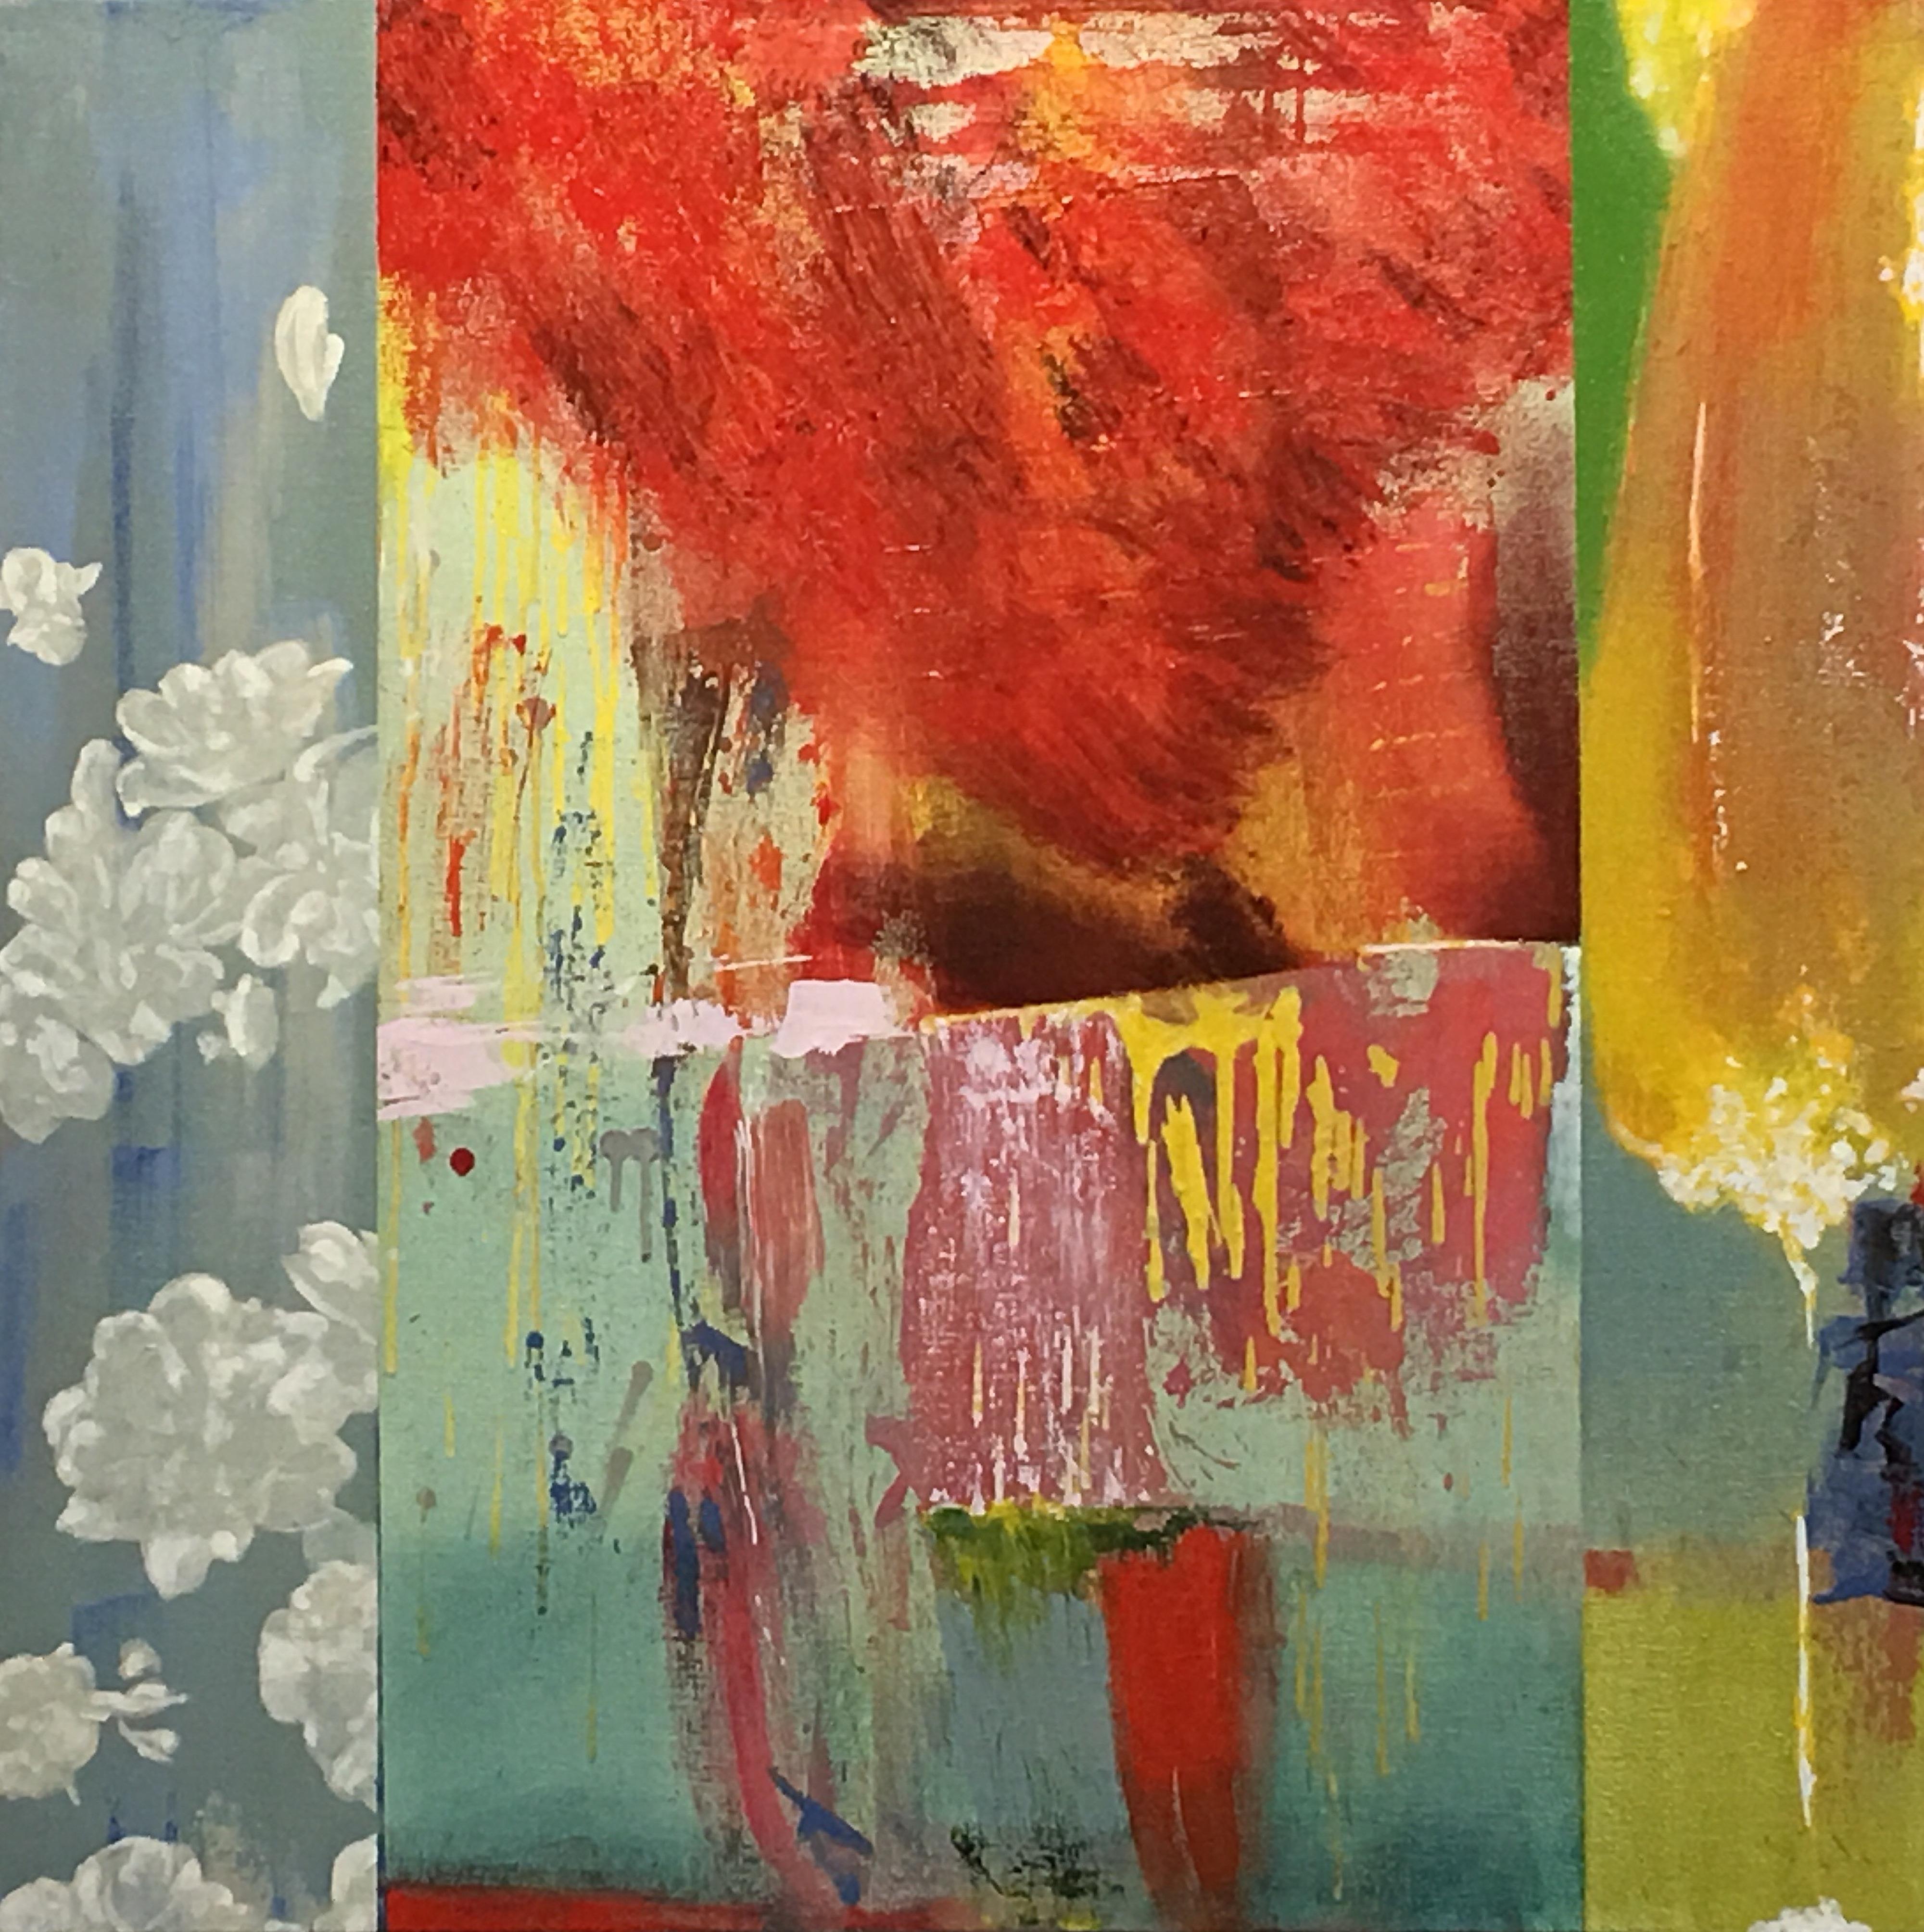 Ganier by Ron Trujillo | ArtworkNetwork.com